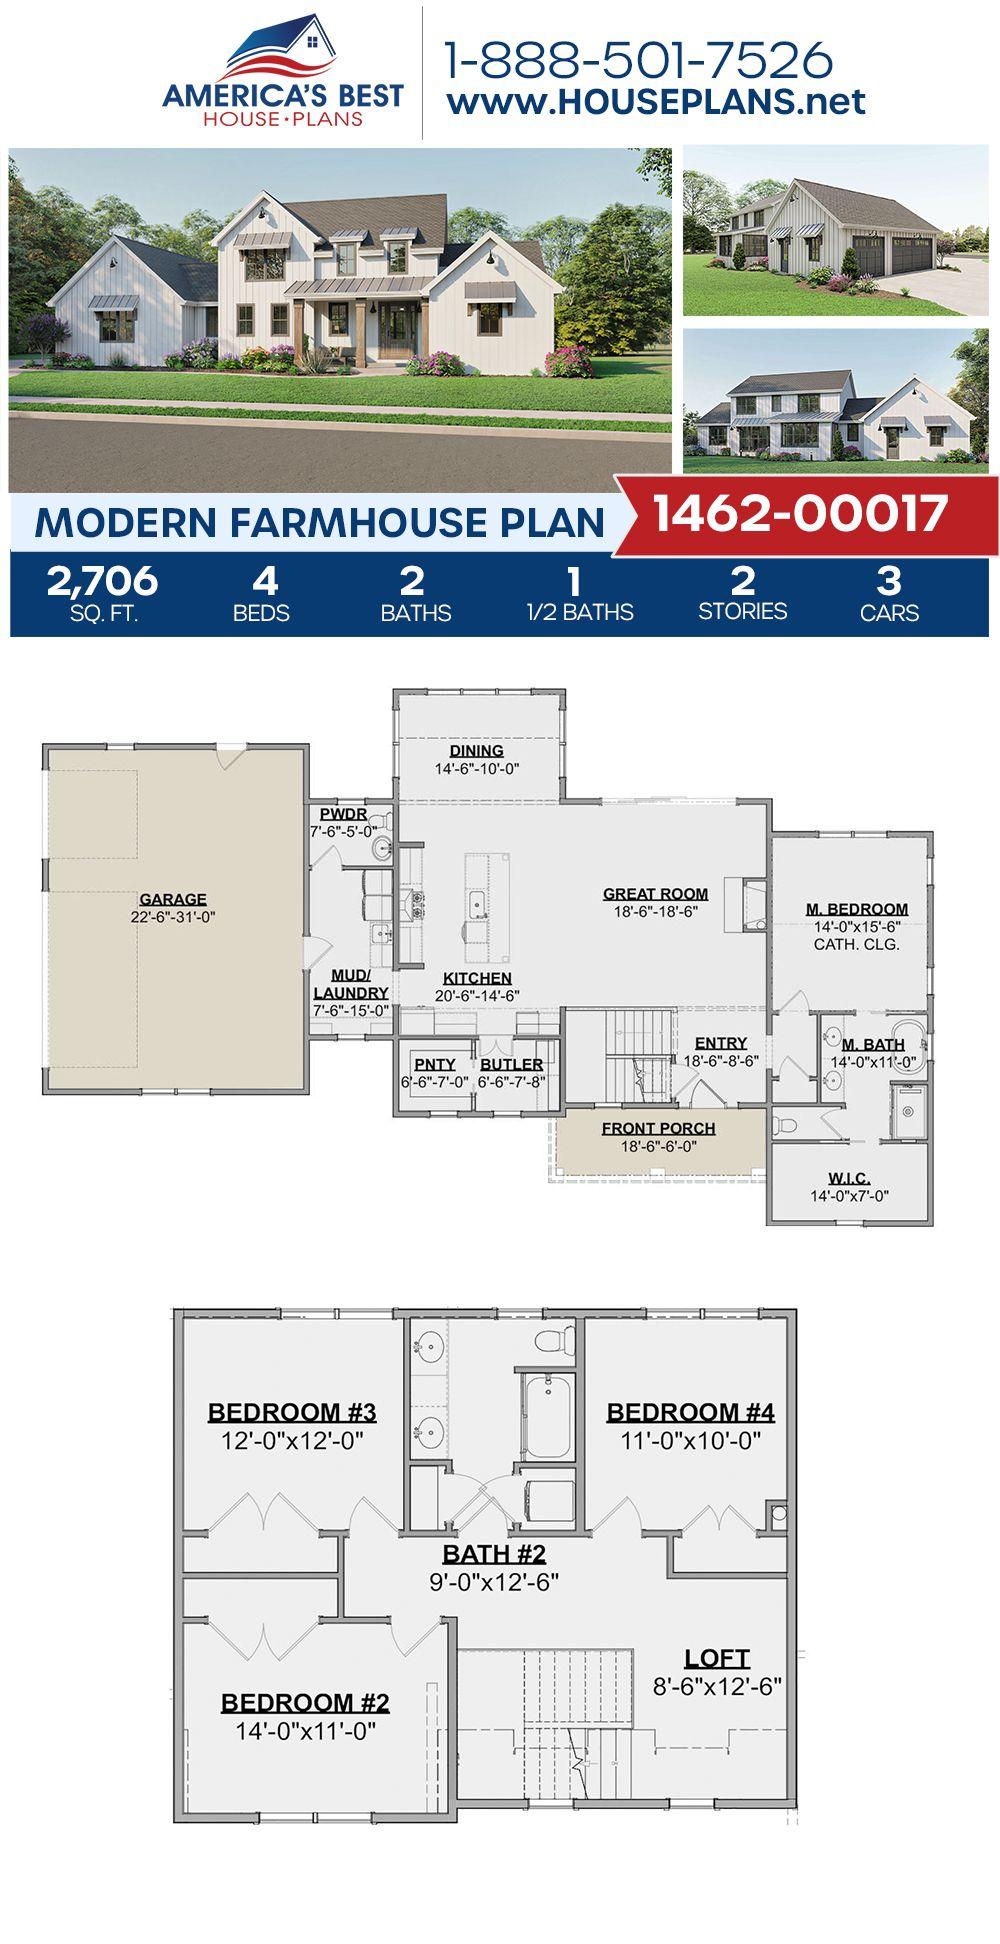 House Plan 1462 00017 Modern Farmhouse Plan 2 706 Square Feet 4 Bedrooms 2 5 Bathrooms In 2020 Modern Farmhouse Plans Farmhouse Plans Exclusive House Plan